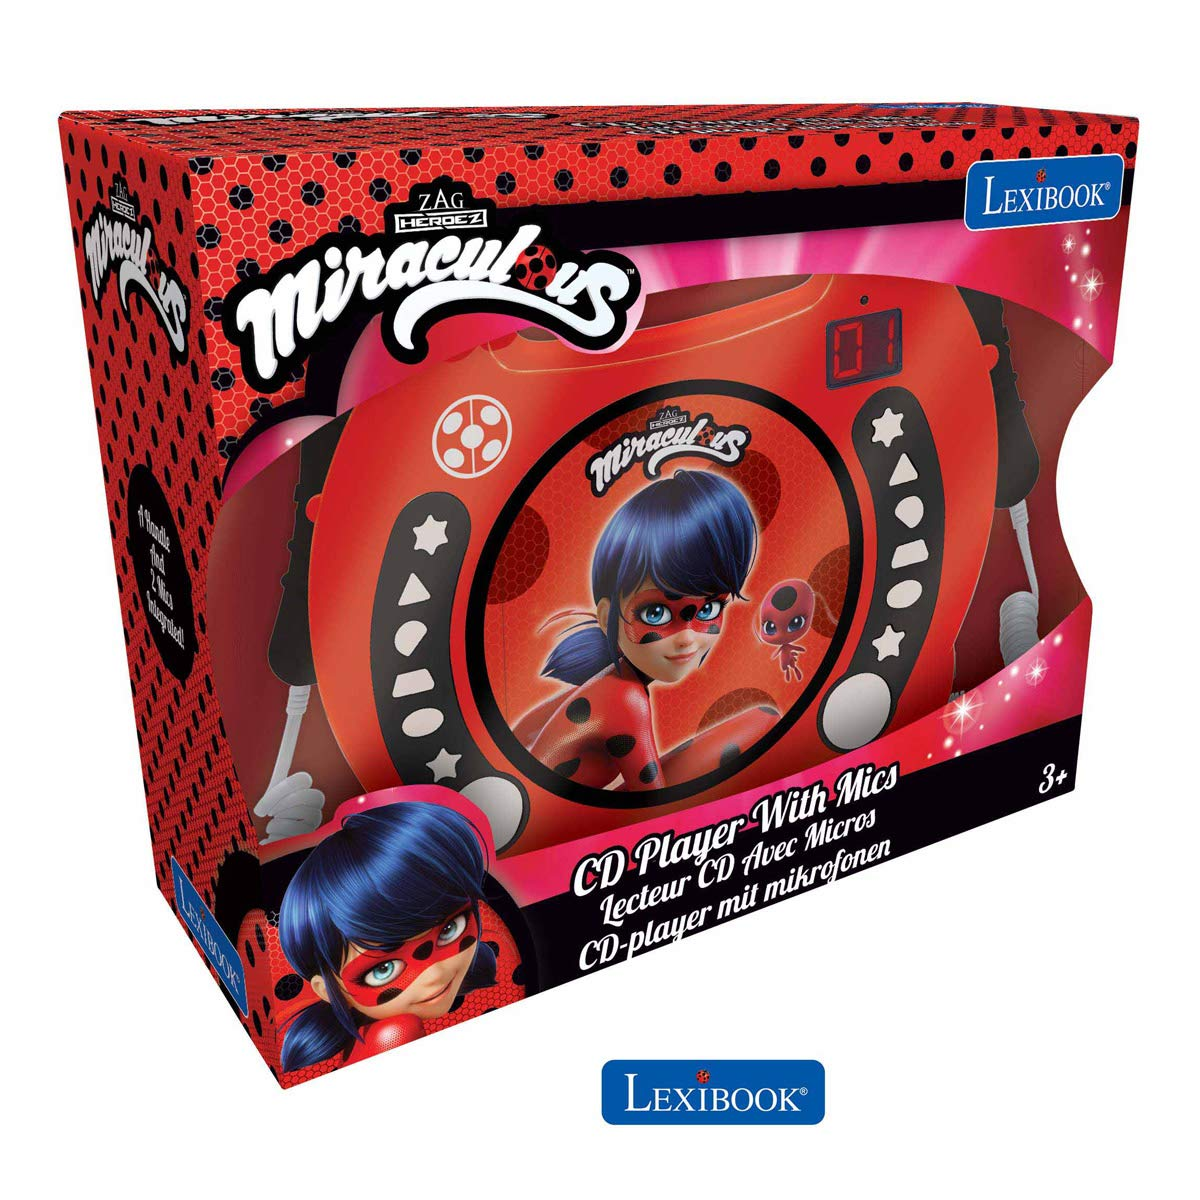 LEXiBOOK Miraculous Ladybug Radio CD, Programming Function, Headphones Jack, for Kids, with Power Supply or Batteries, Red/Black, RCDK100MI by LEXiBOOK (Image #5)